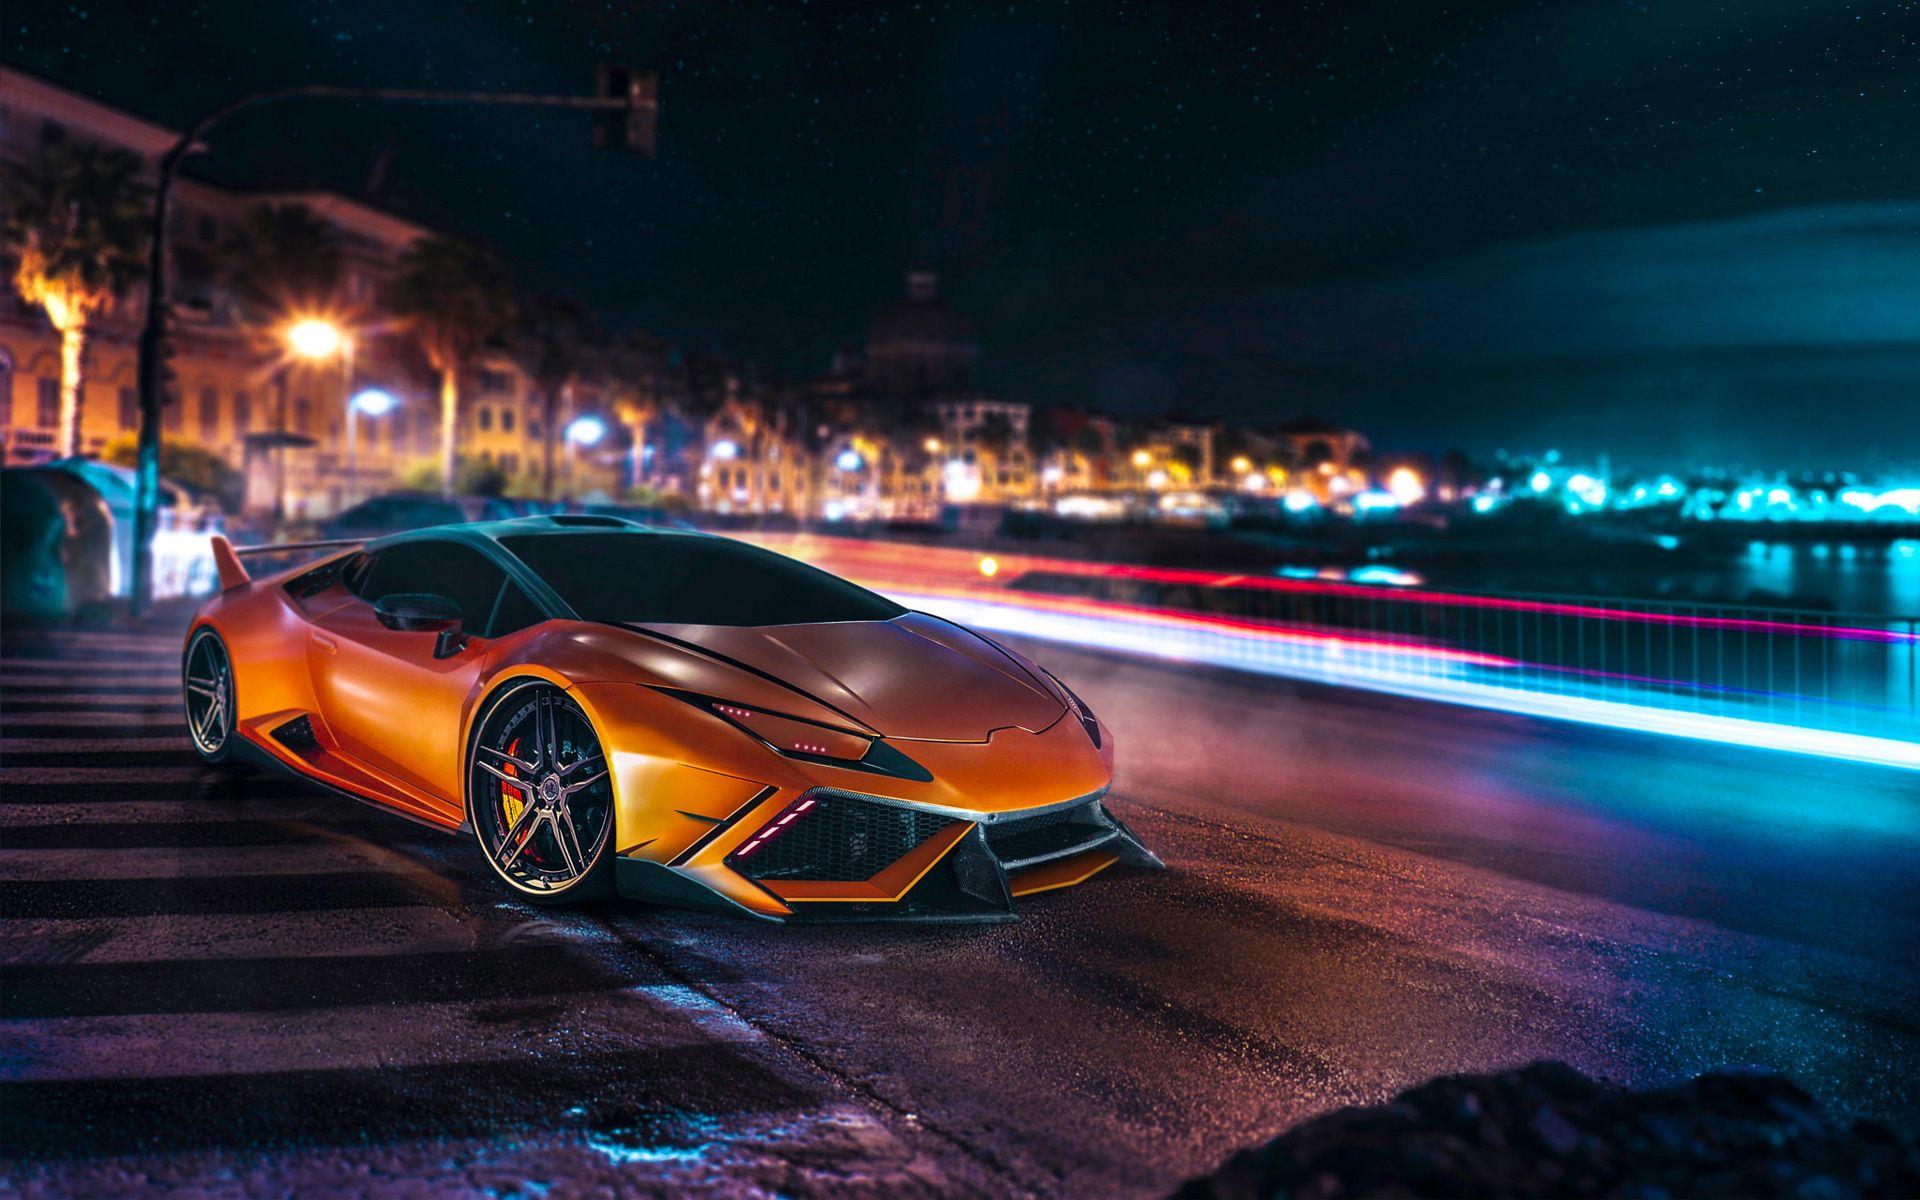 7e7c3a13a12bfb41a3bf95edec459301 Marvelous Lamborghini Huracan Hack asphalt 8 Cars Trend